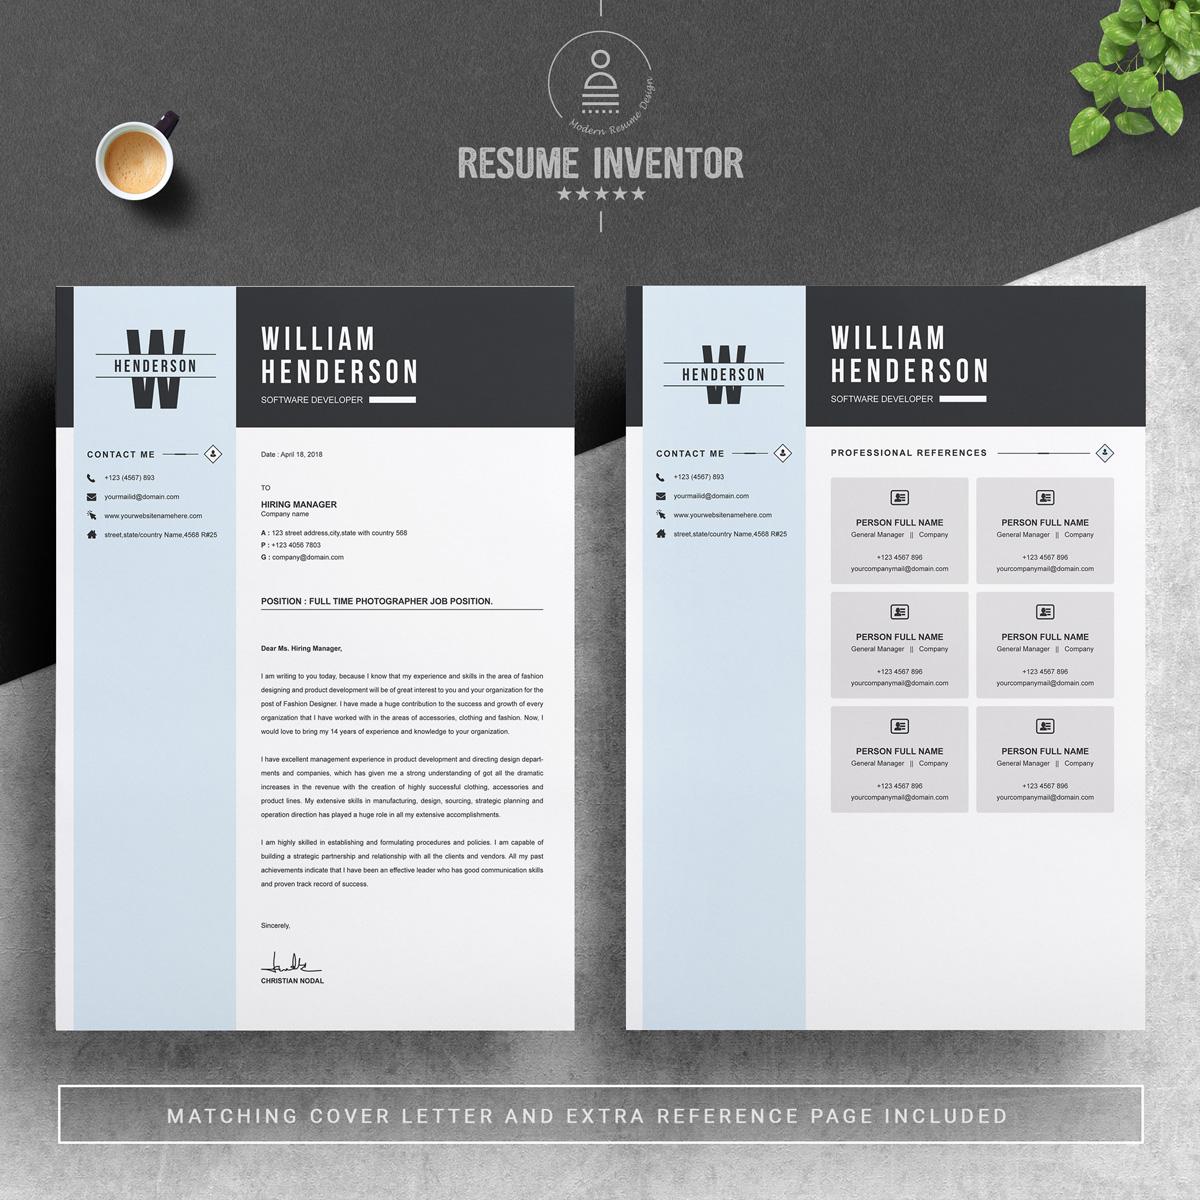 https://s3u.tmimgcdn.com/1860567-1553350388145_03_2-Pages-Free-Resume-Design-Template.jpg